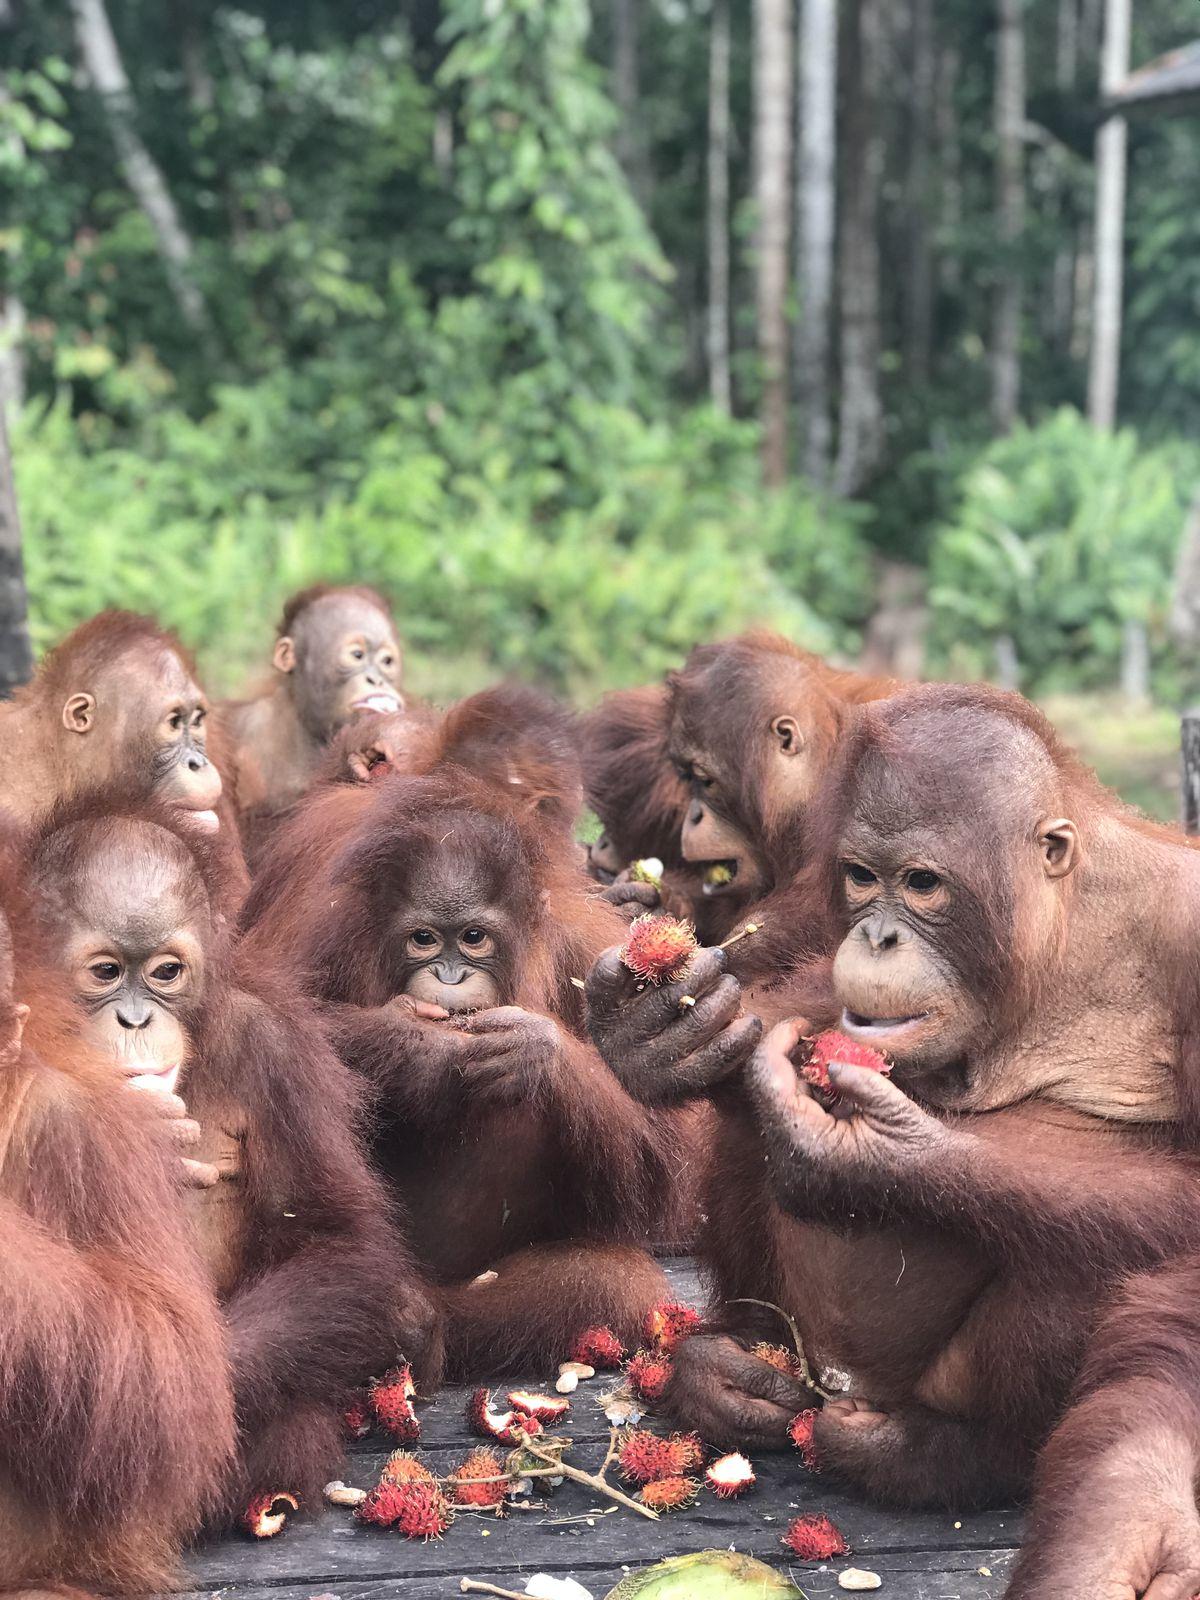 Orangutans enjoy a buffet of rambutan.